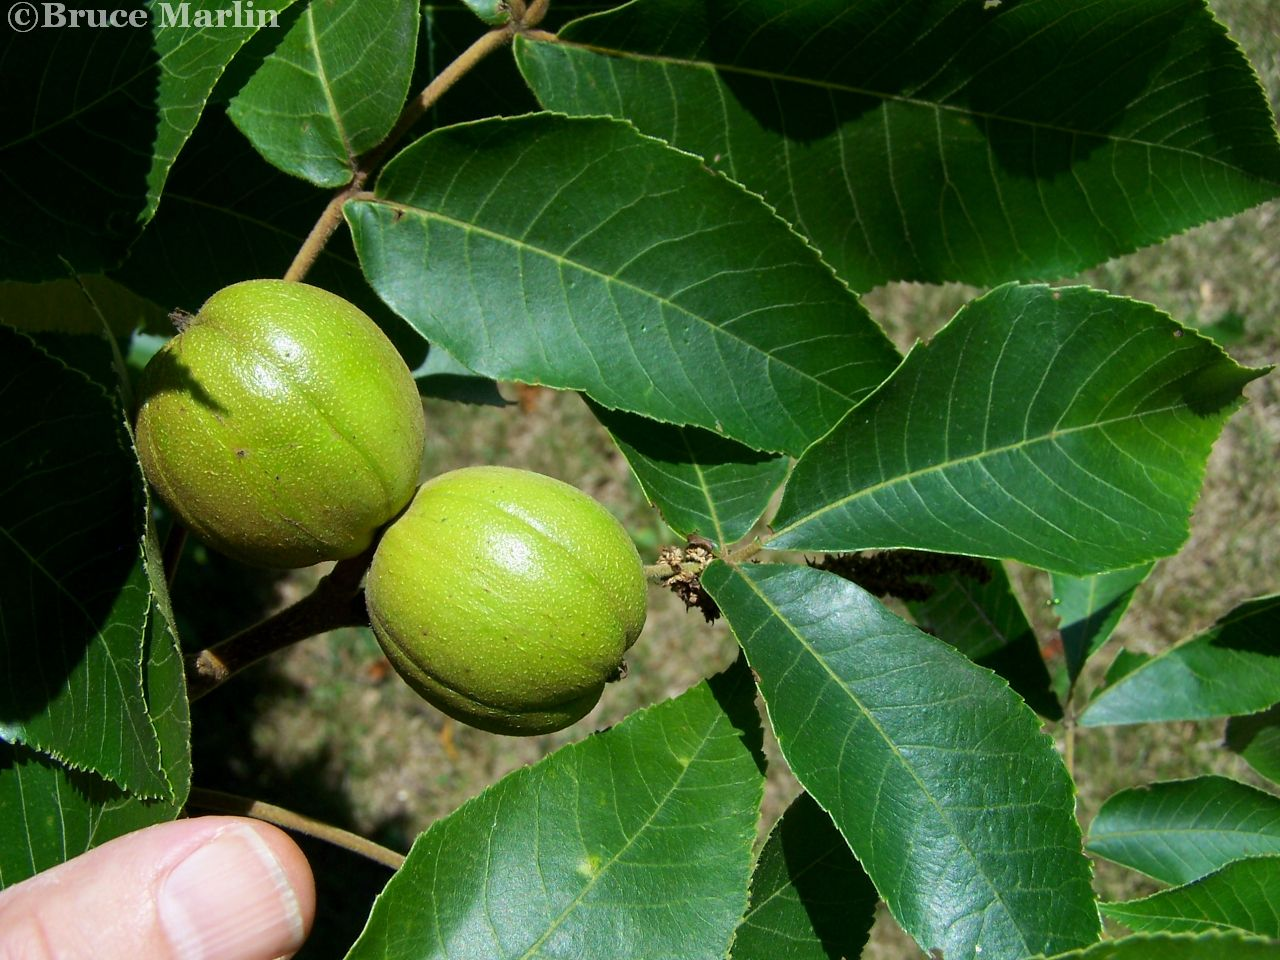 Hickory Nuts & Foliage